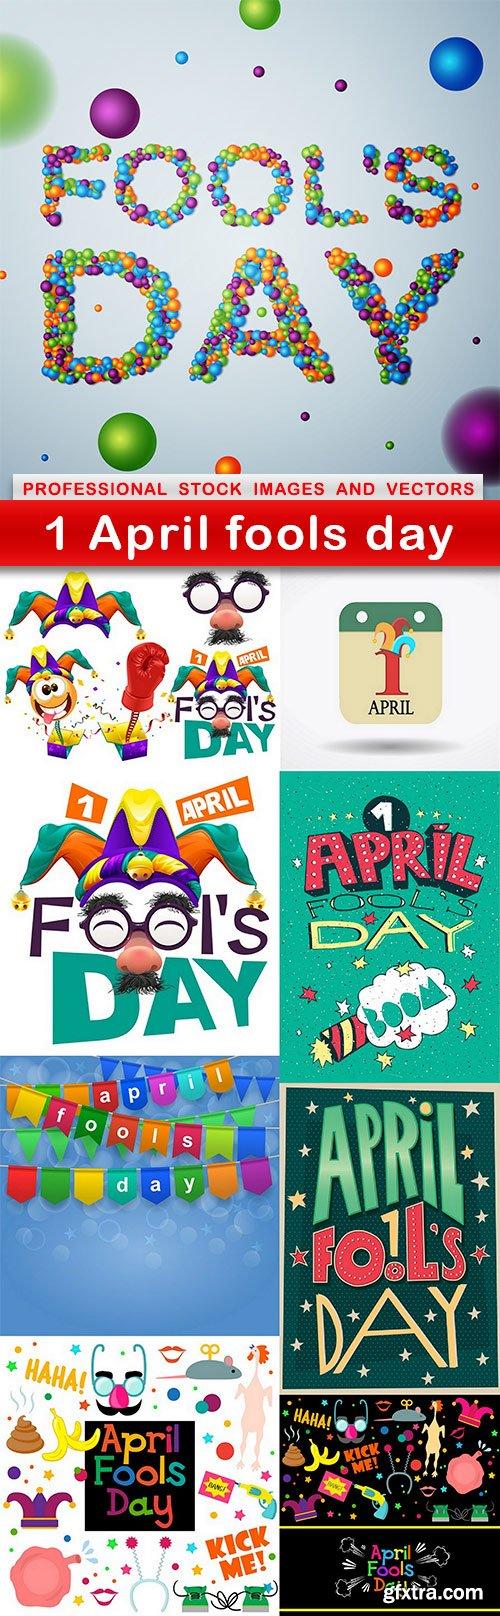 1 April fools day - 9 EPS